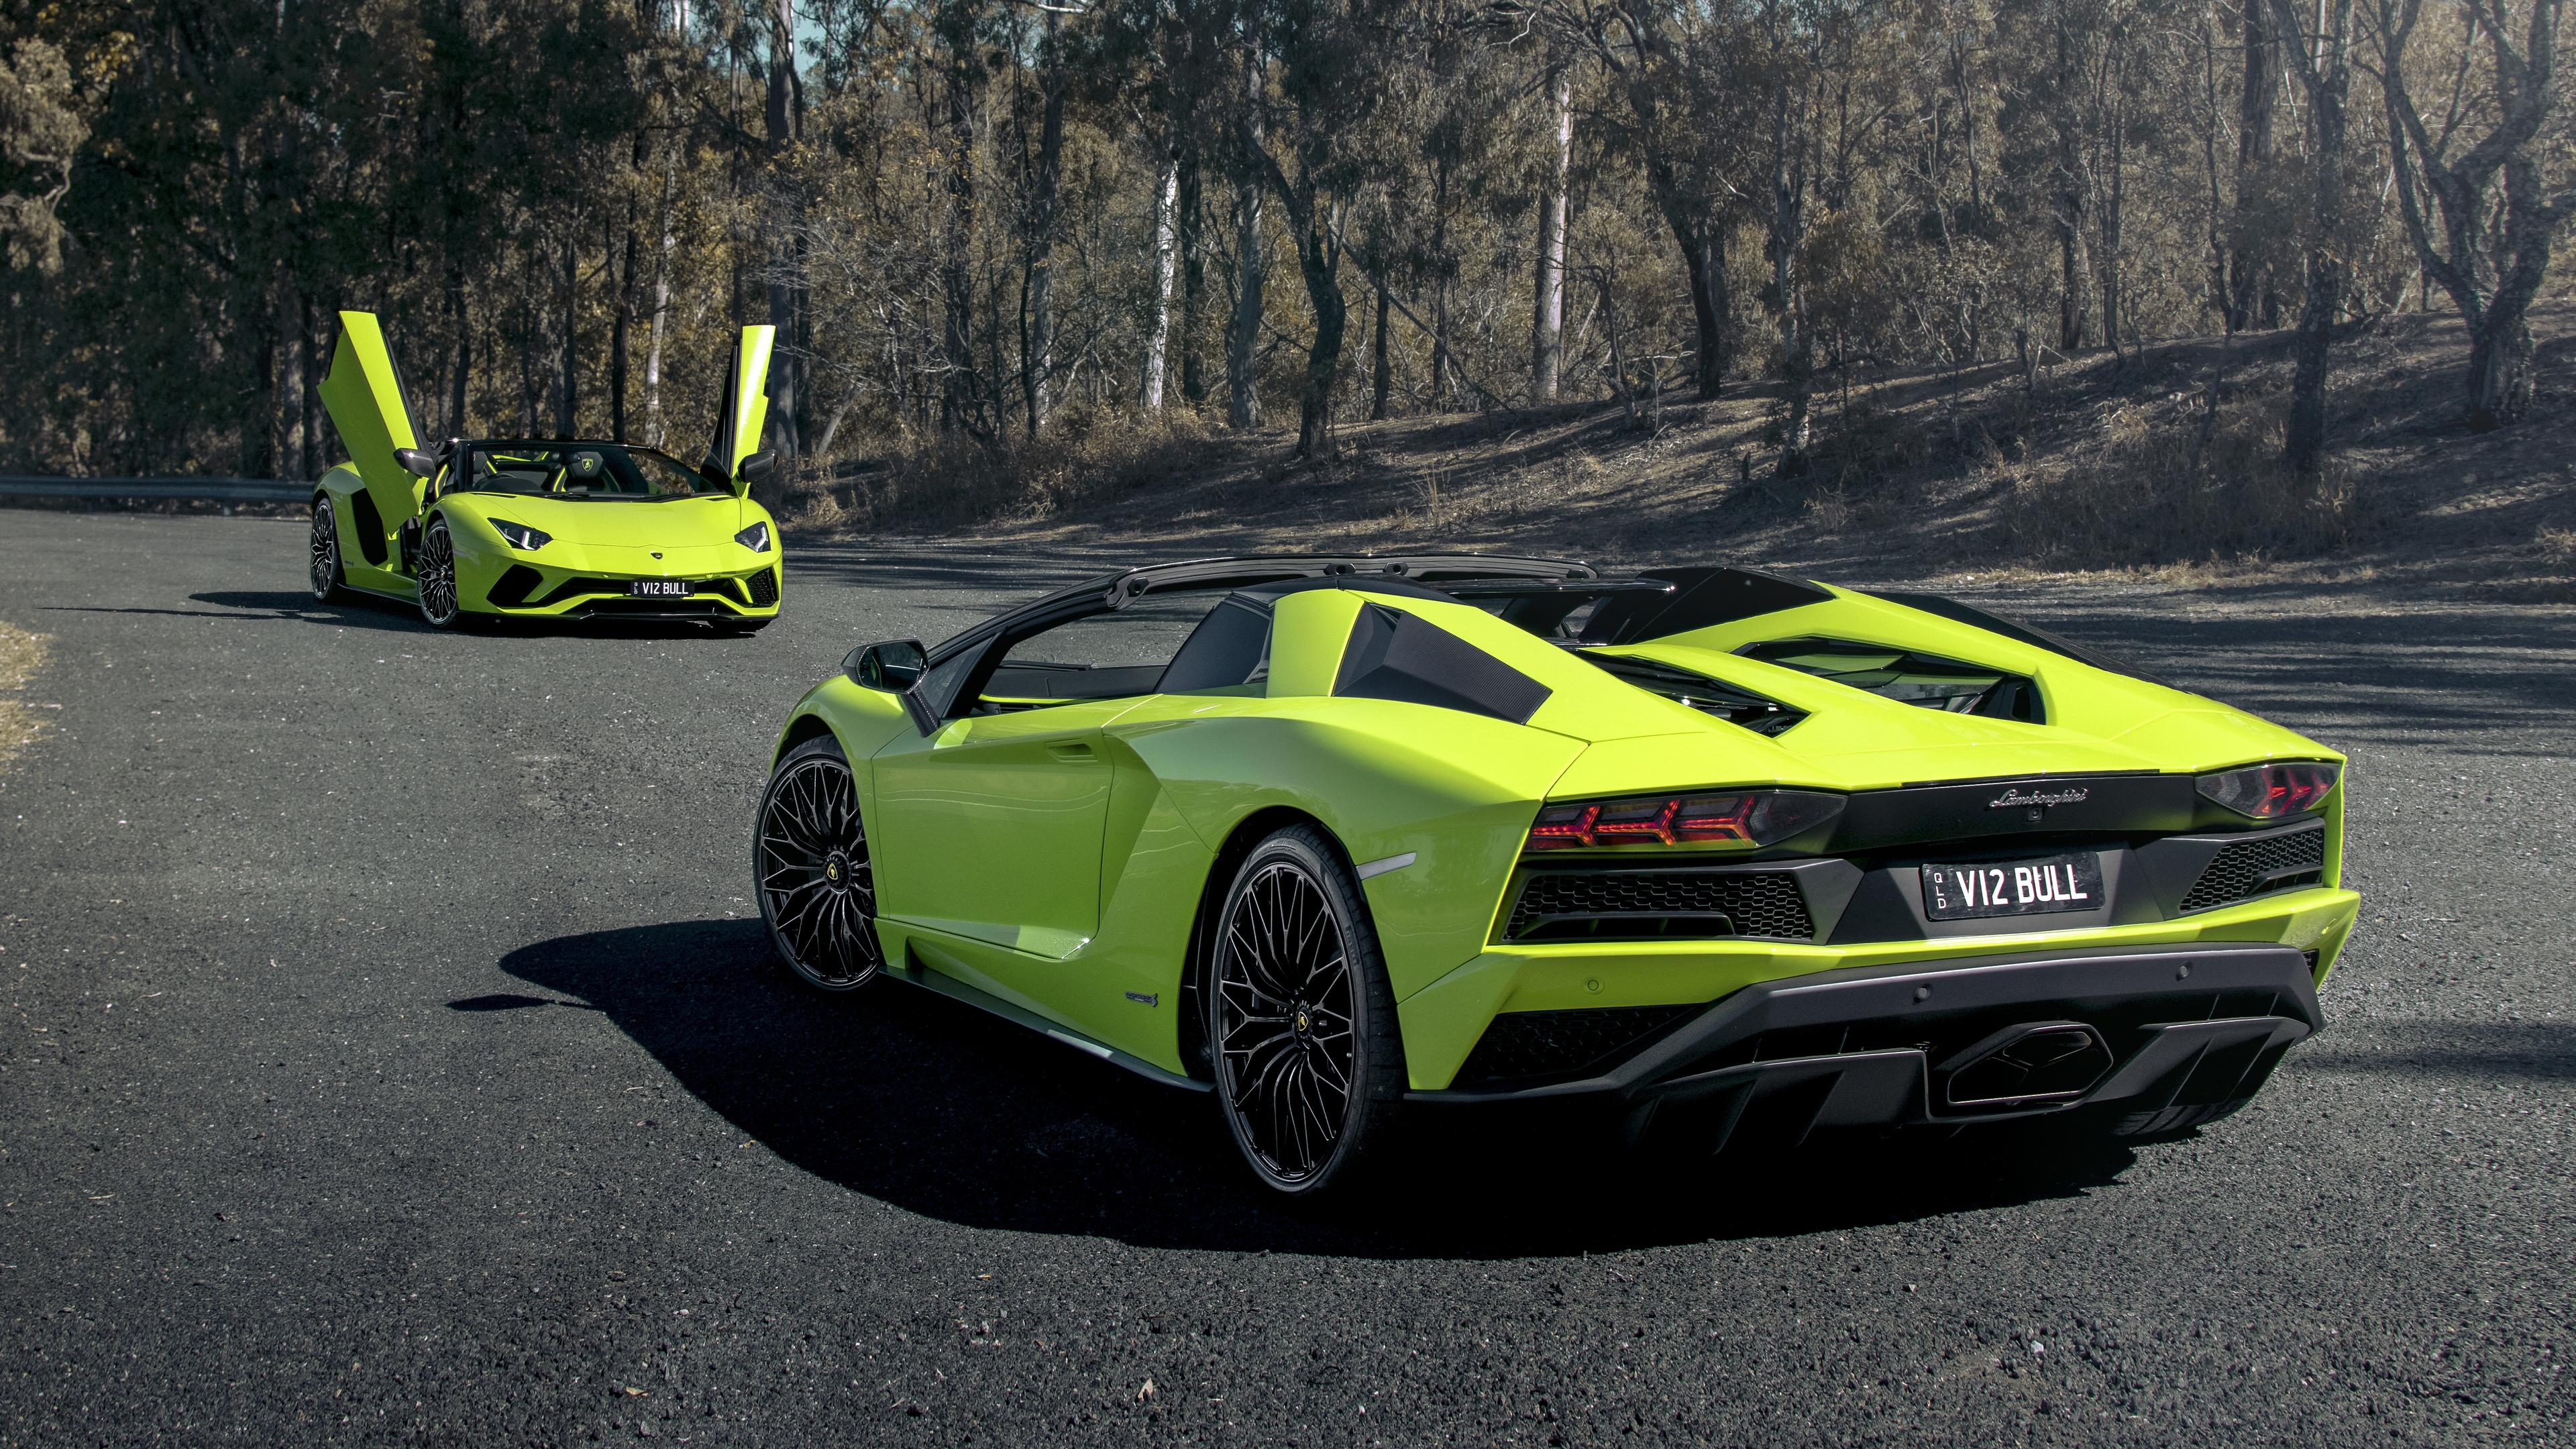 2018 lamborghini aventador s roadster 1563221166 - 2018 Lamborghini Aventador S Roadster - lamborghini wallpapers, lamborghini aventador wallpapers, hd-wallpapers, cars wallpapers, 5k wallpapers, 4k-wallpapers